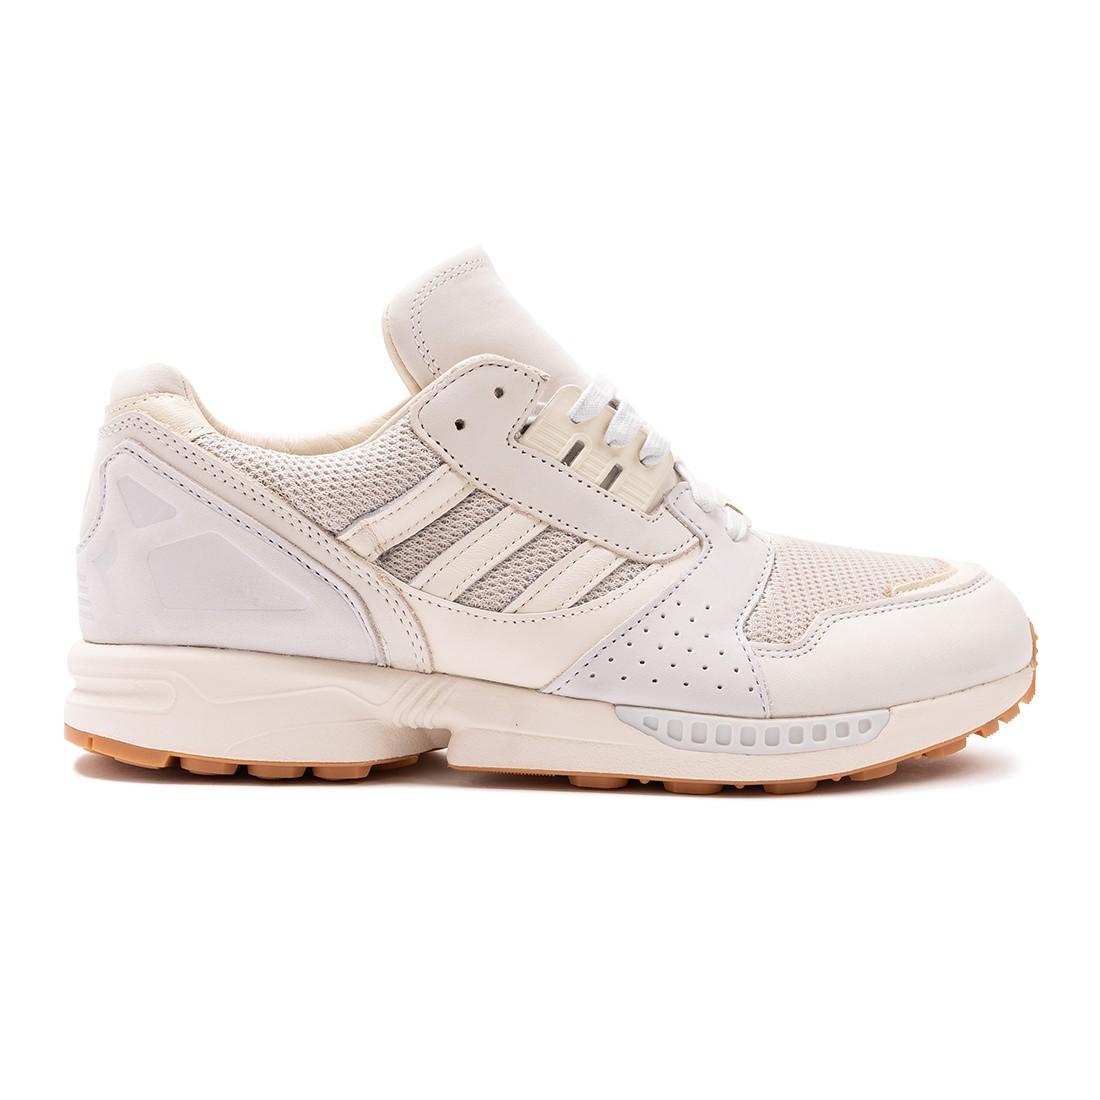 Adidas Men ZX 8000 Qualität (white / crystal white / core white)